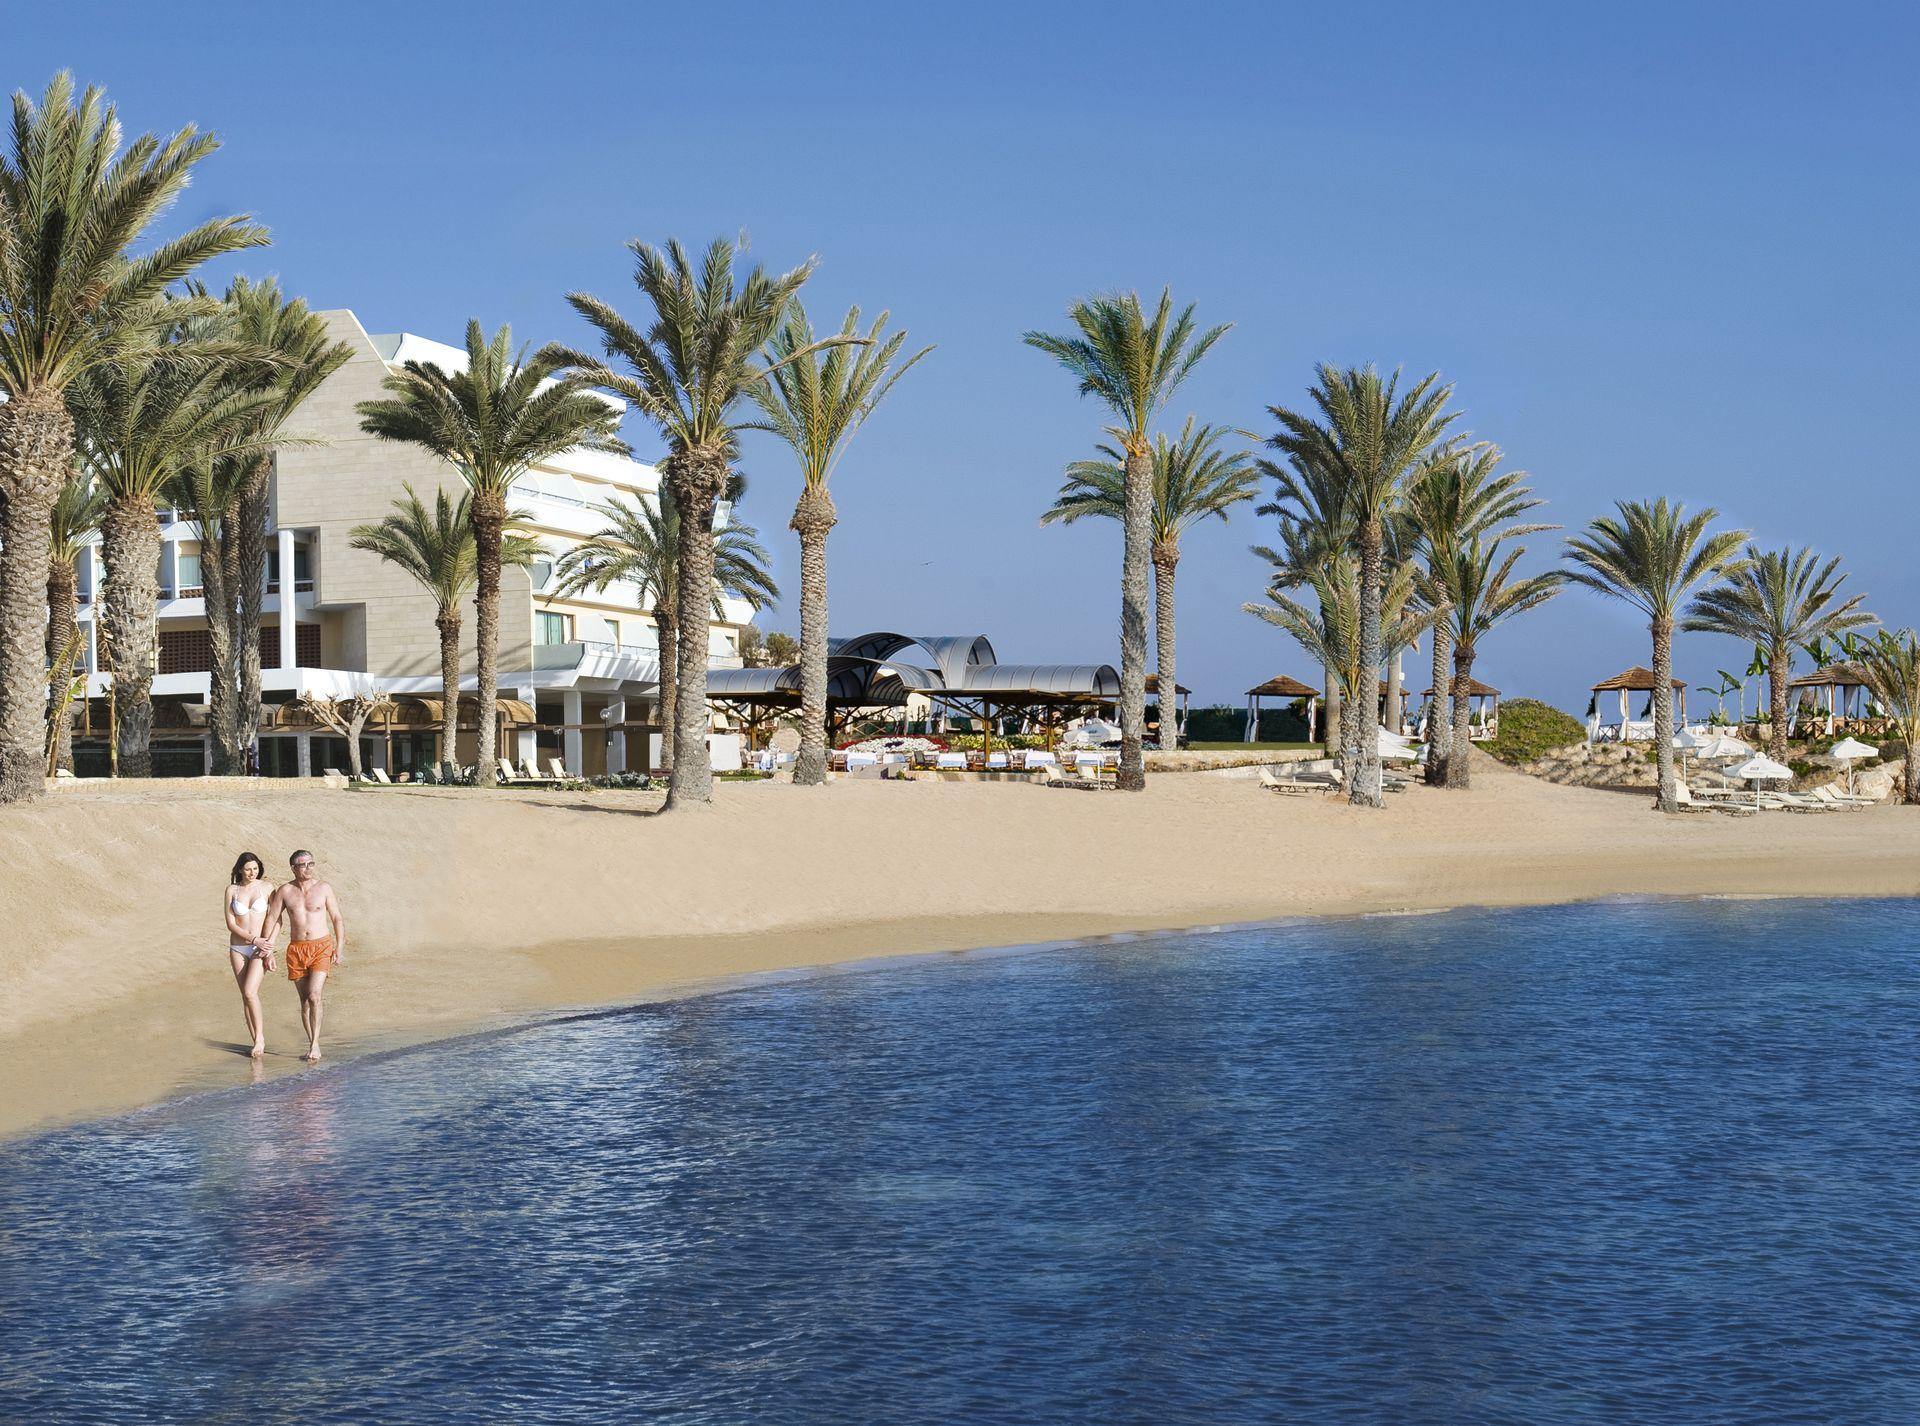 _02-pioneer beach hotel-beach couple_resized